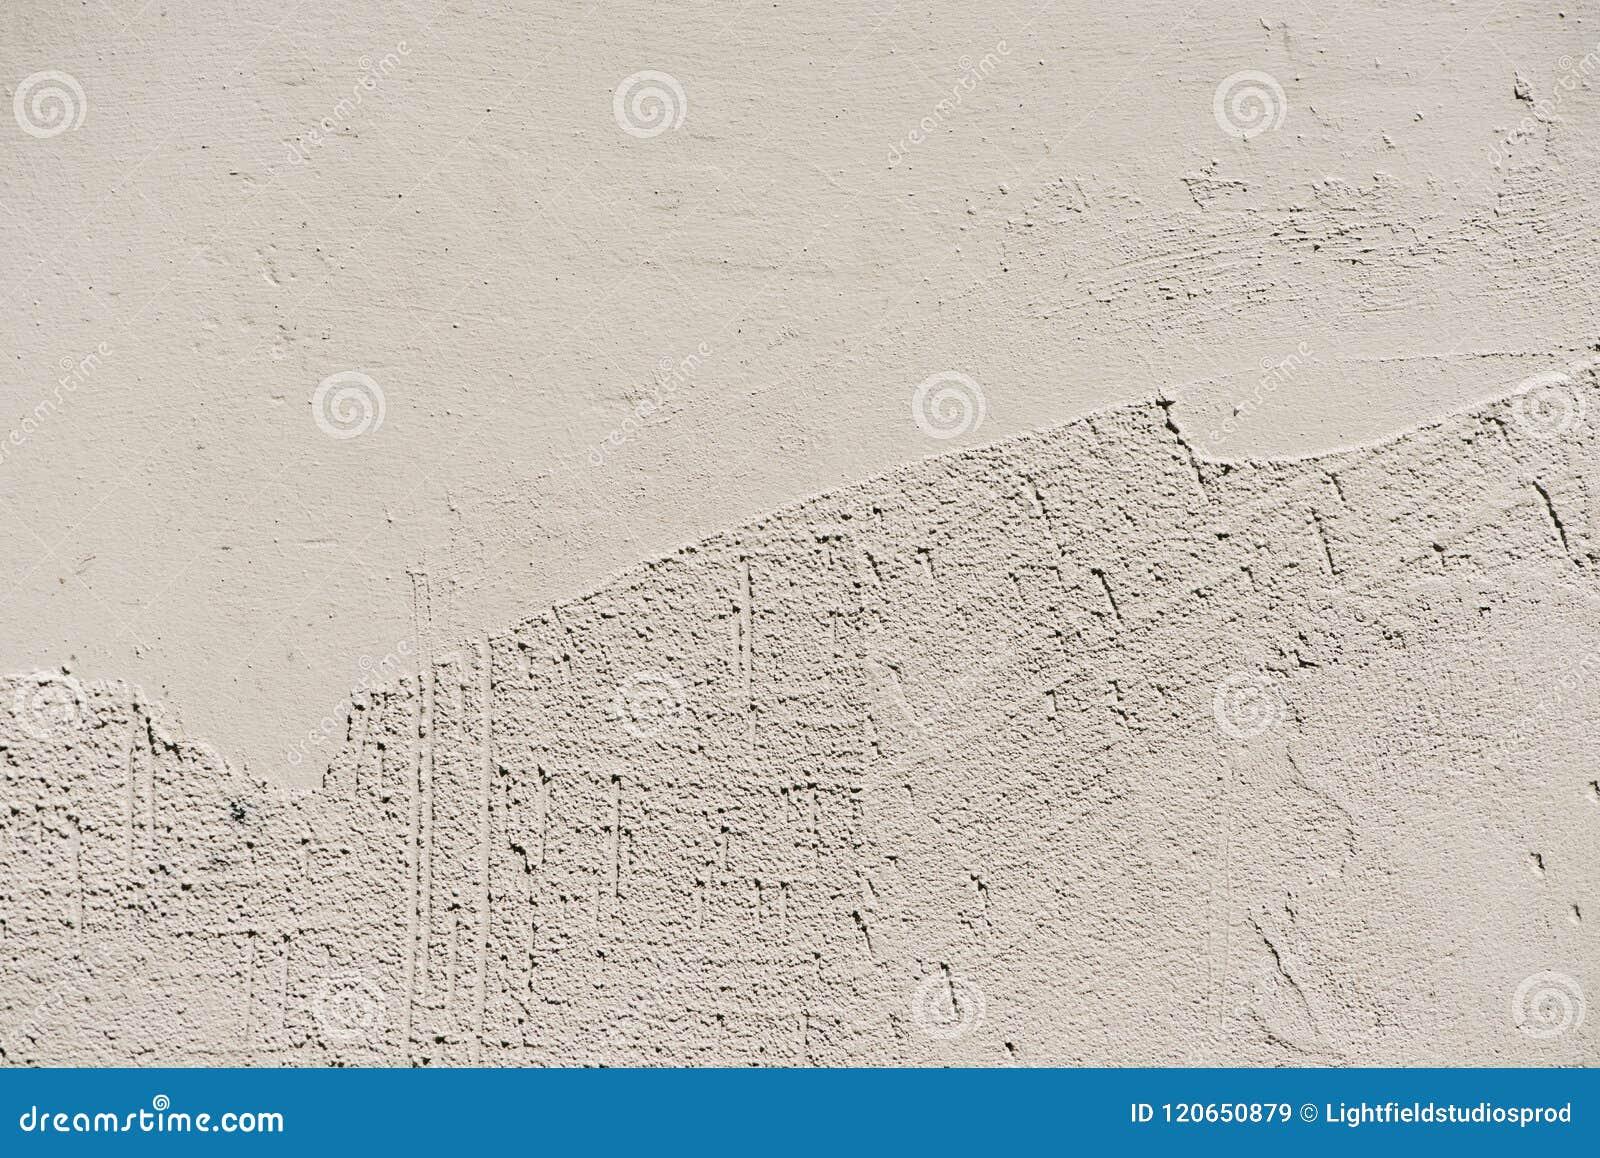 Full frame image of putty stock image. Image of background - 120650879